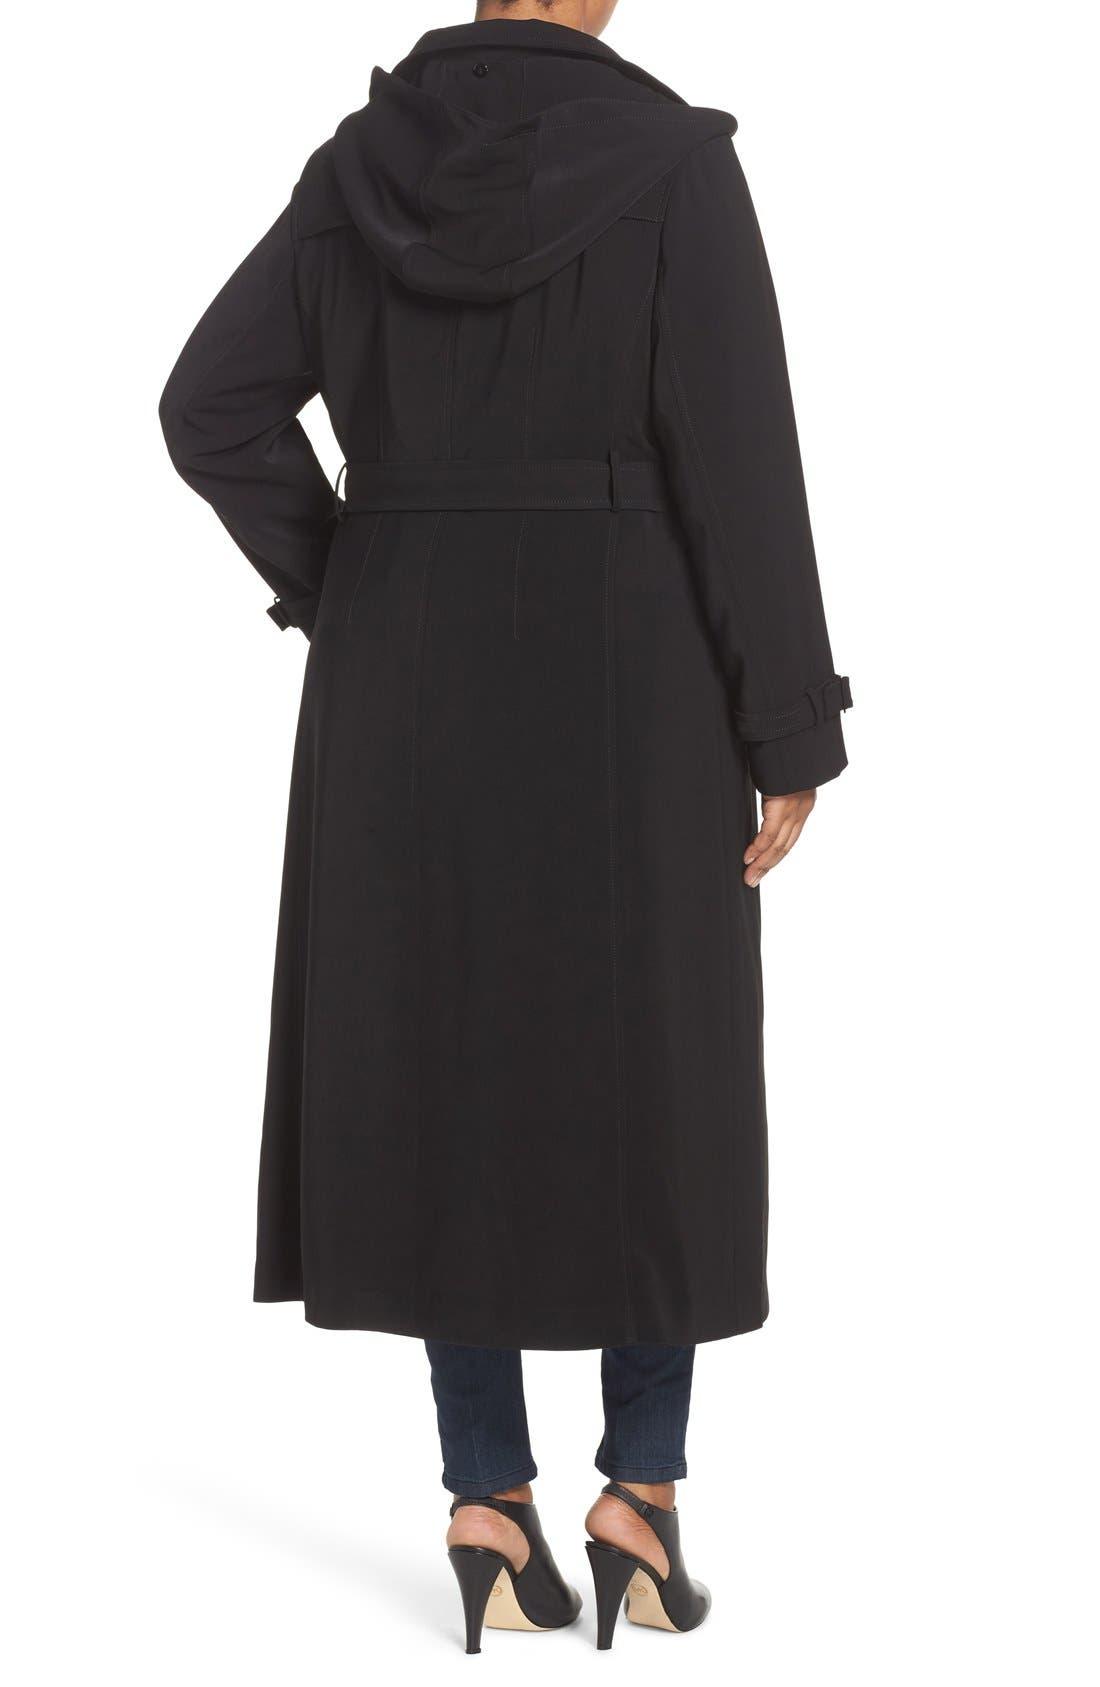 Long Nepage Raincoat with Detachable Hood & Liner,                             Alternate thumbnail 2, color,                             Black